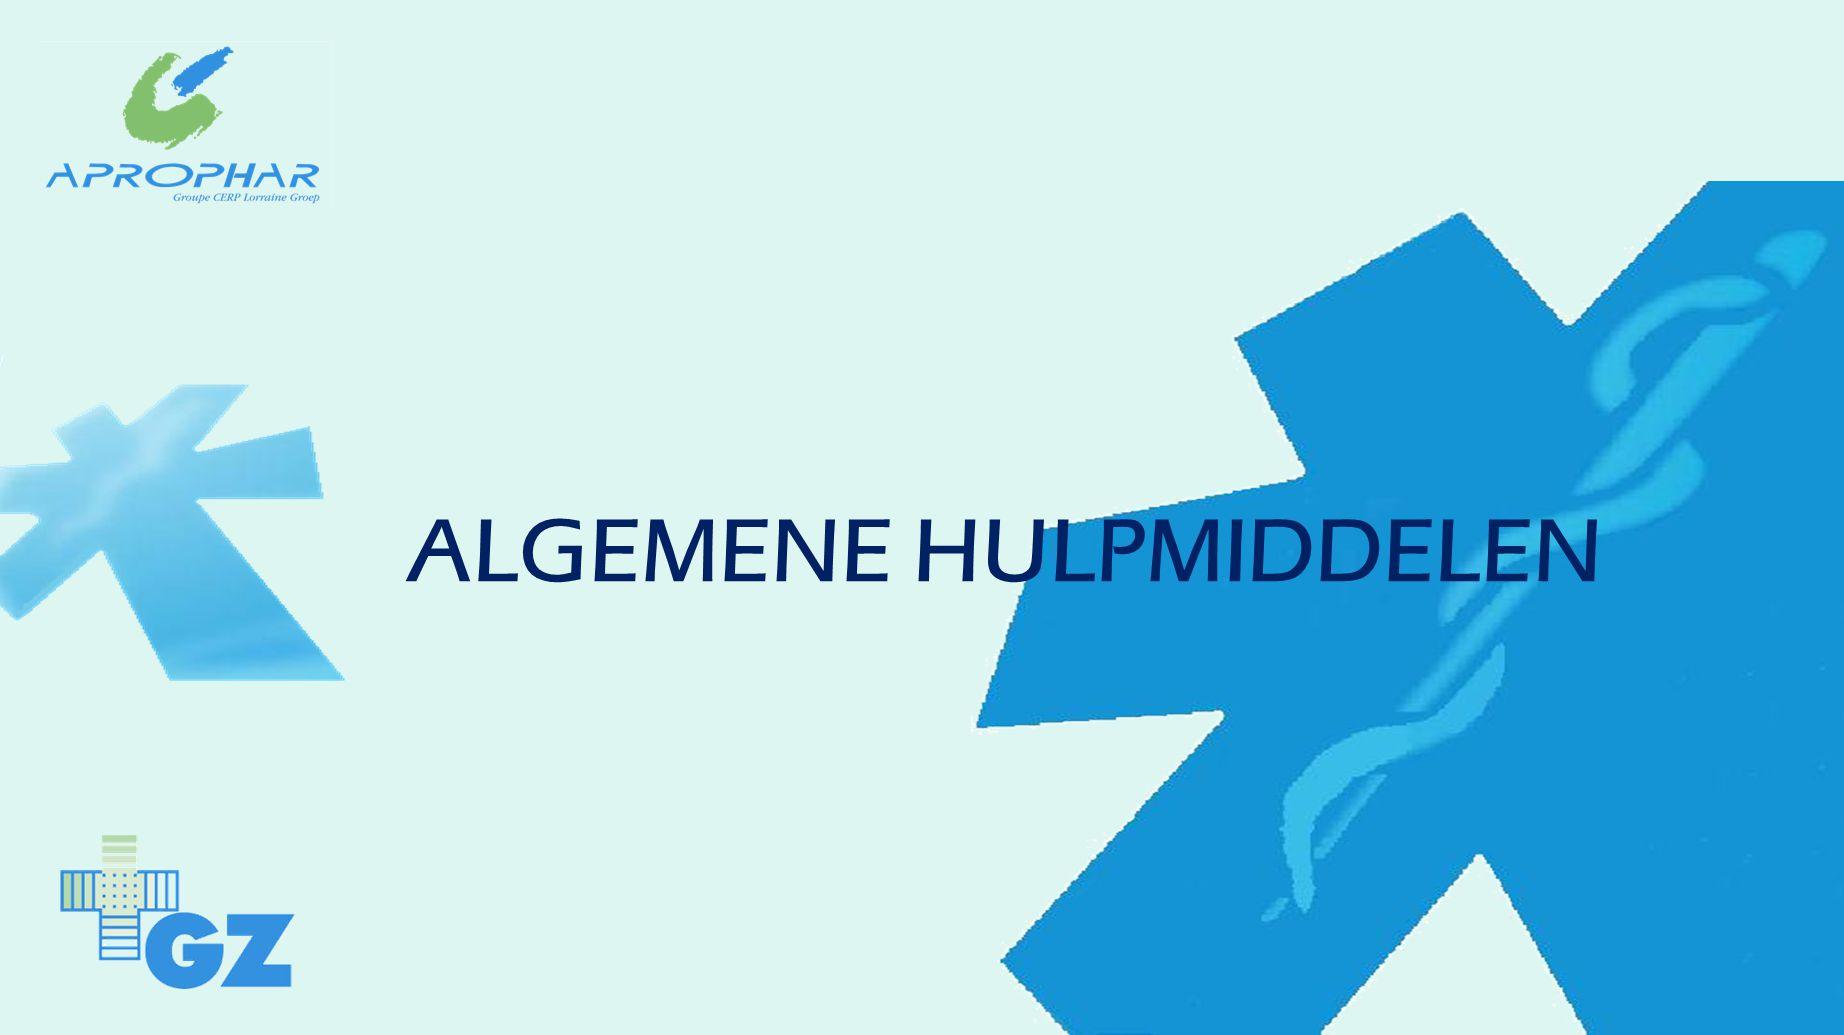 ALGEMENE HULPMIDDELEN